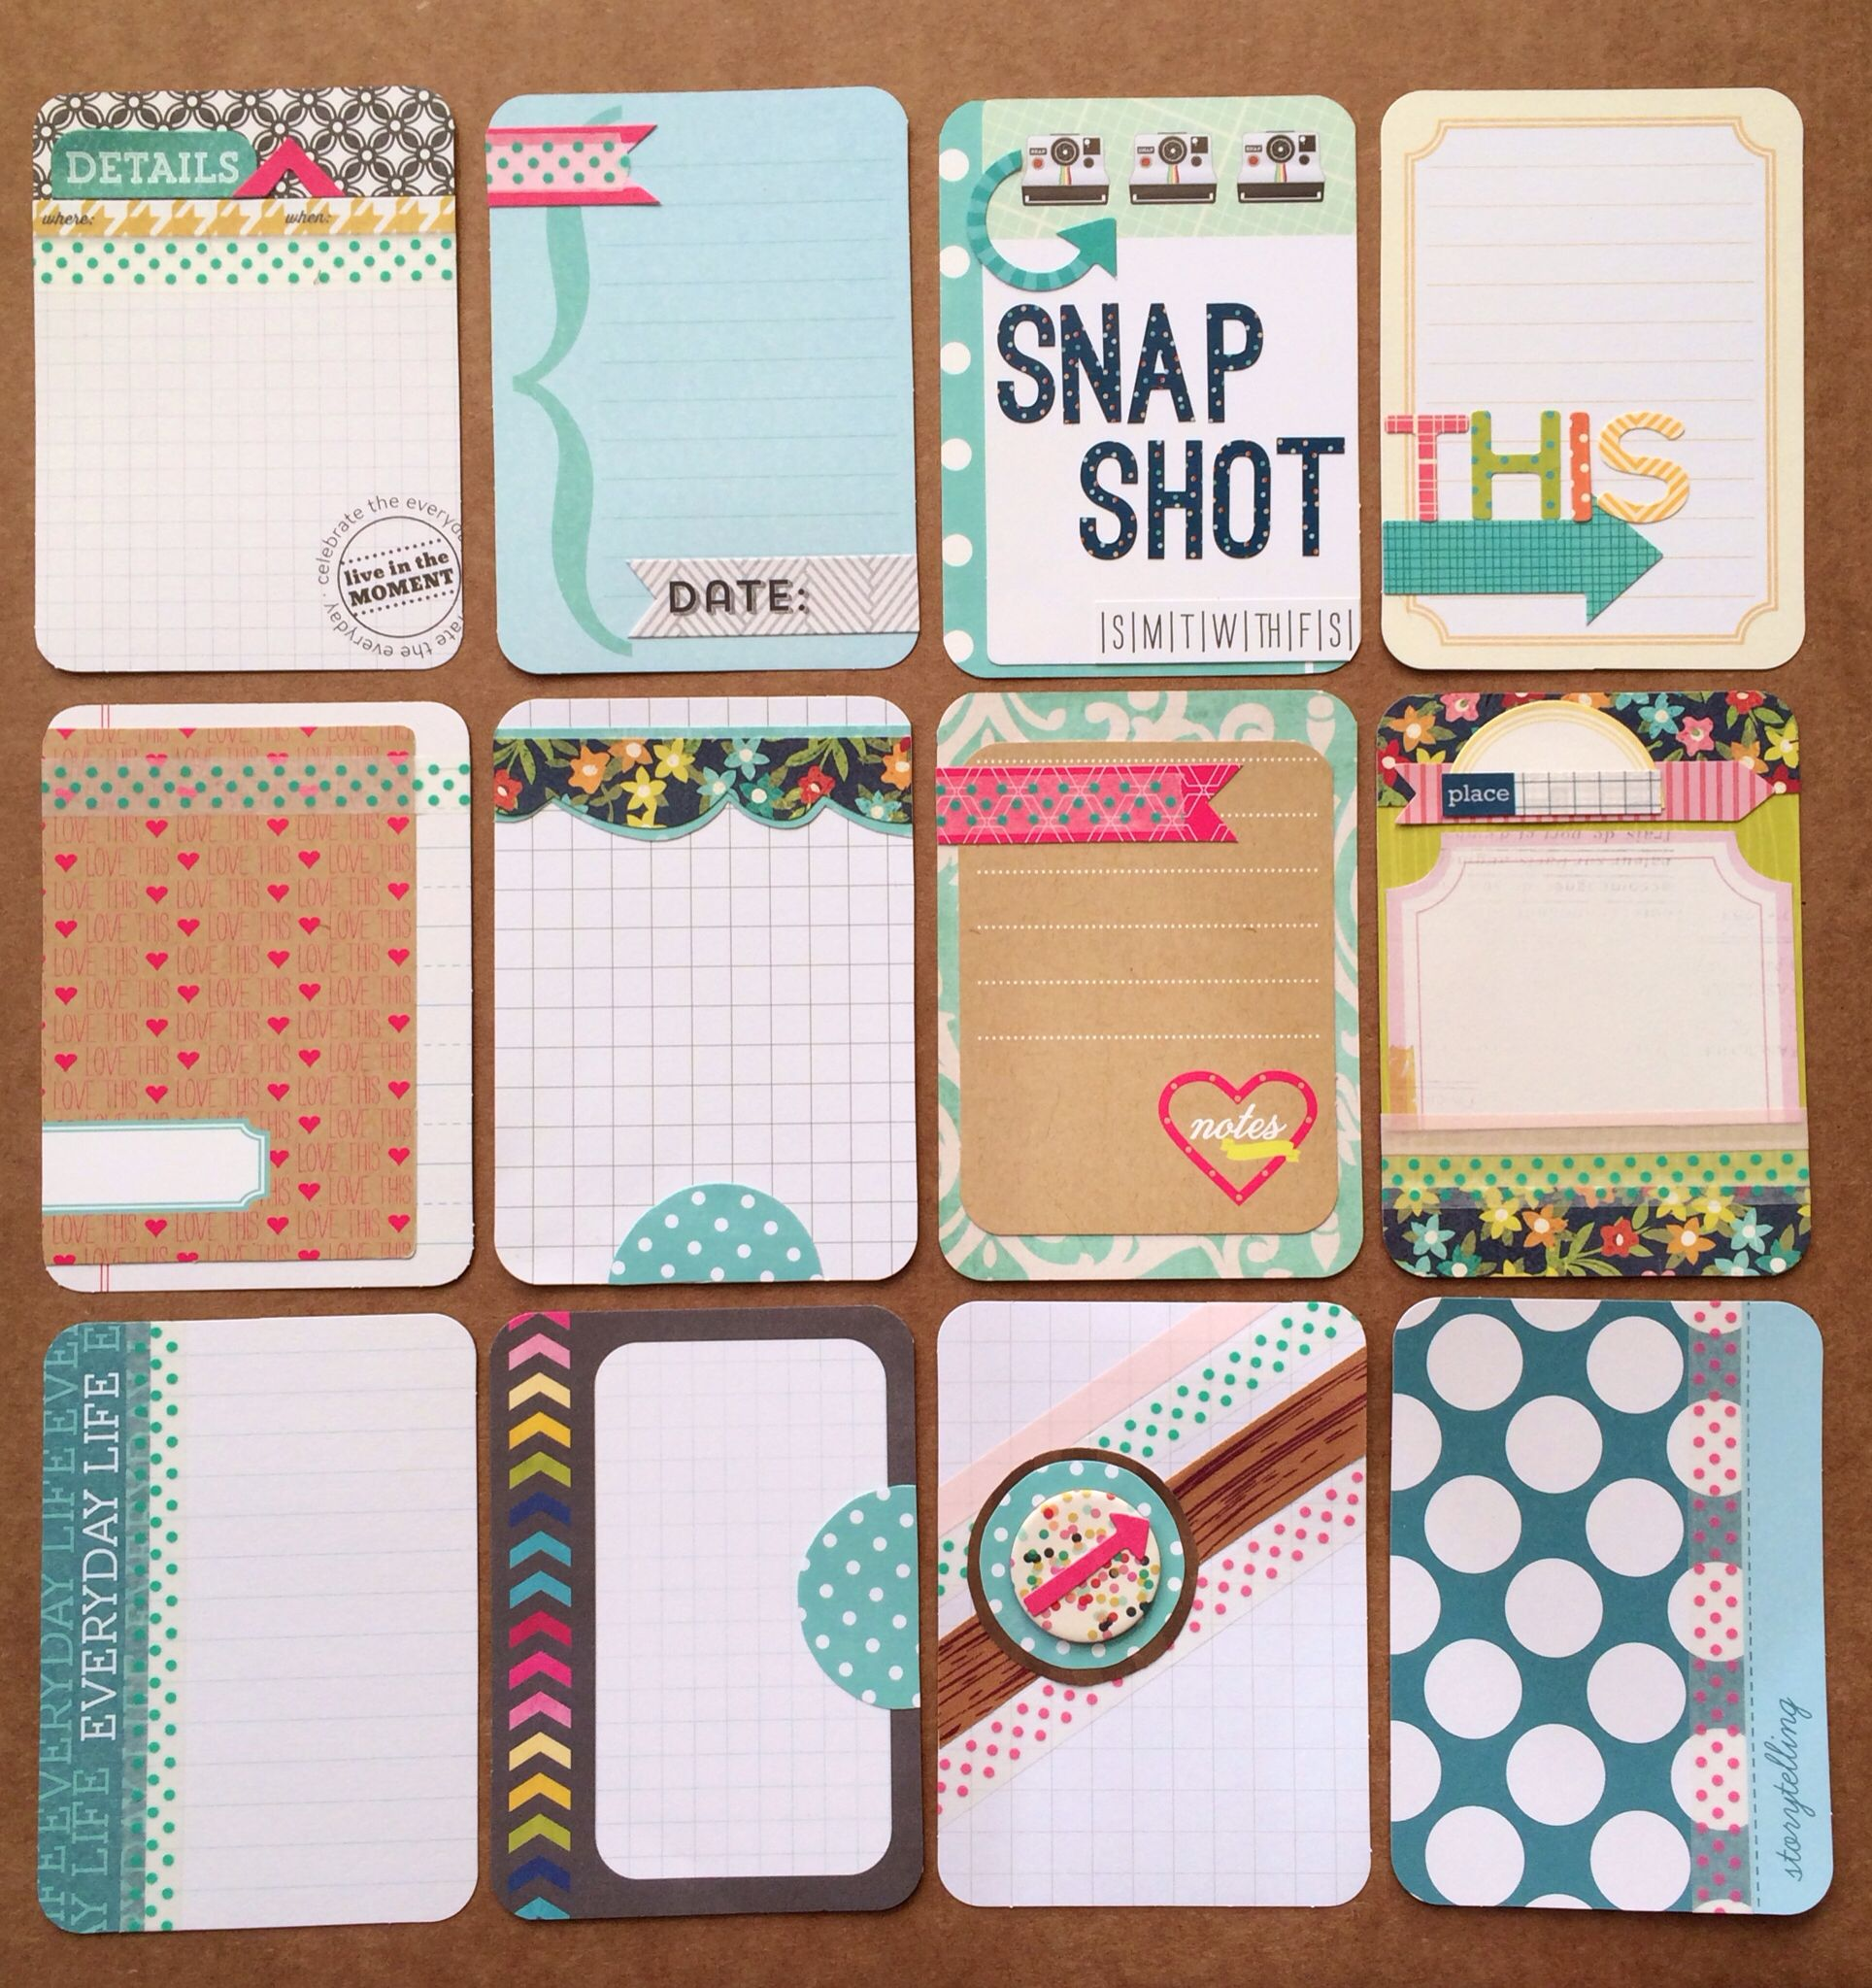 How to make scrapbook look good - Cards